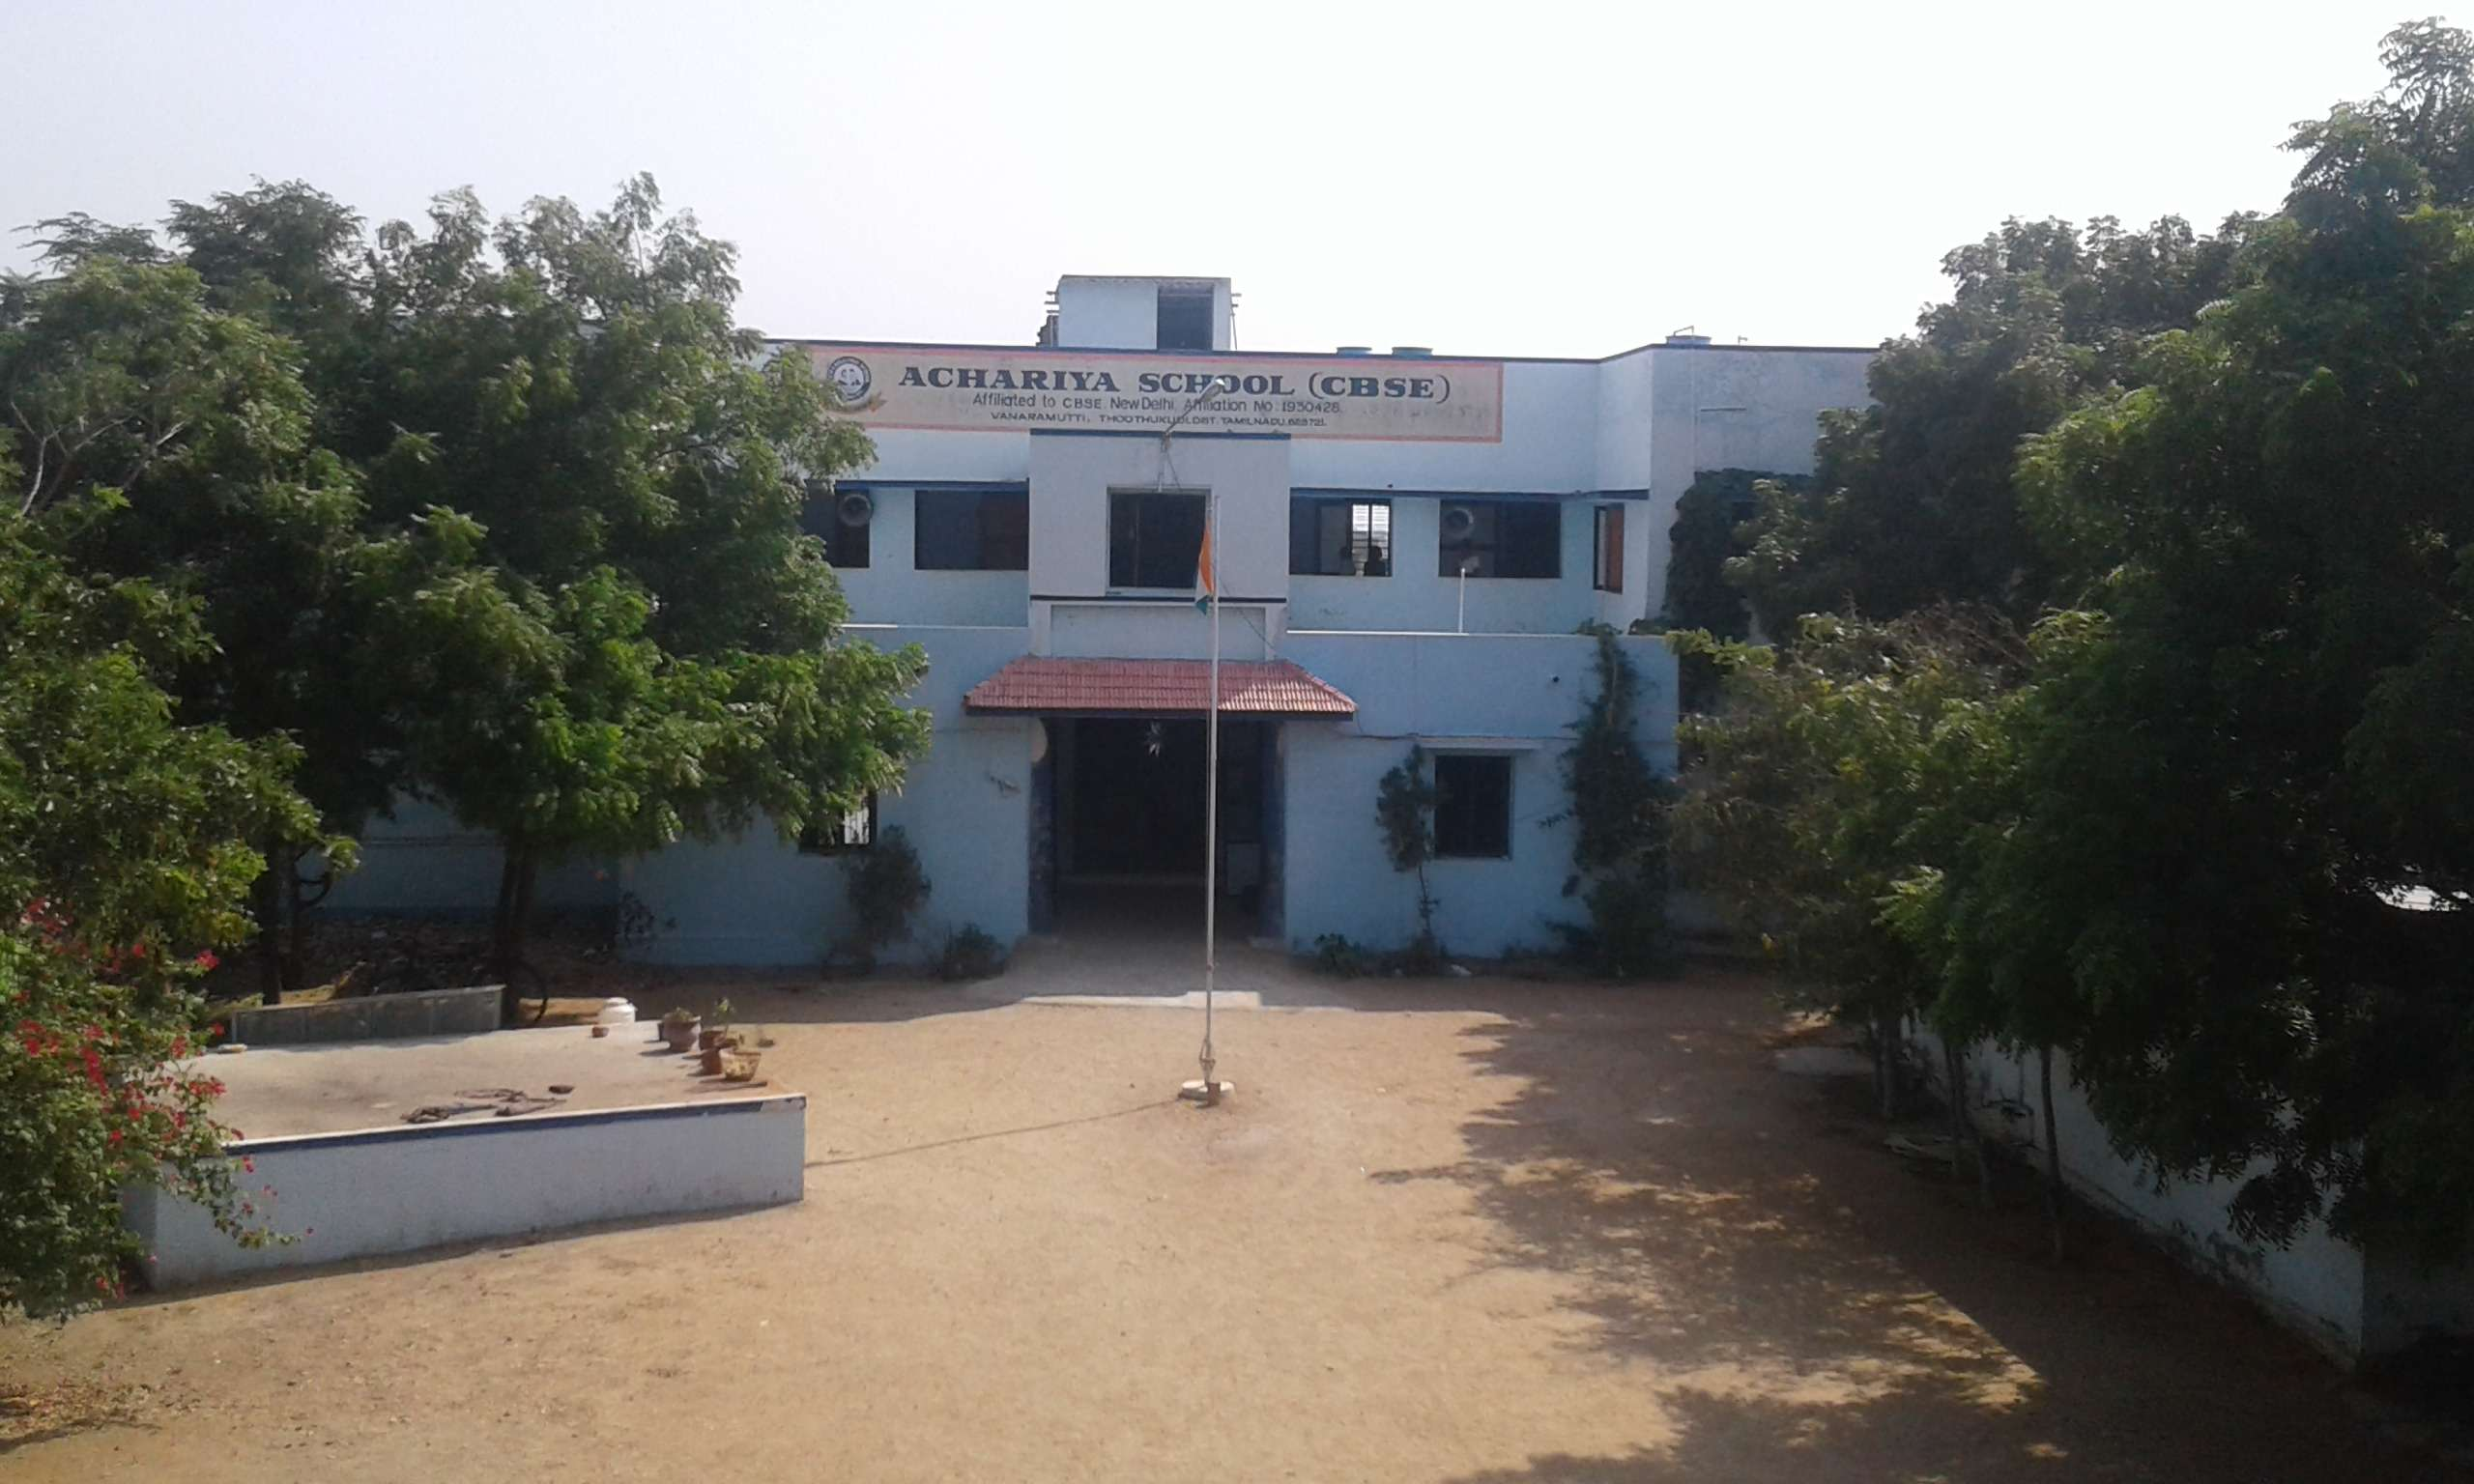 Achariya school 3 185 1 Muthumariamman Kovil Road 1930428